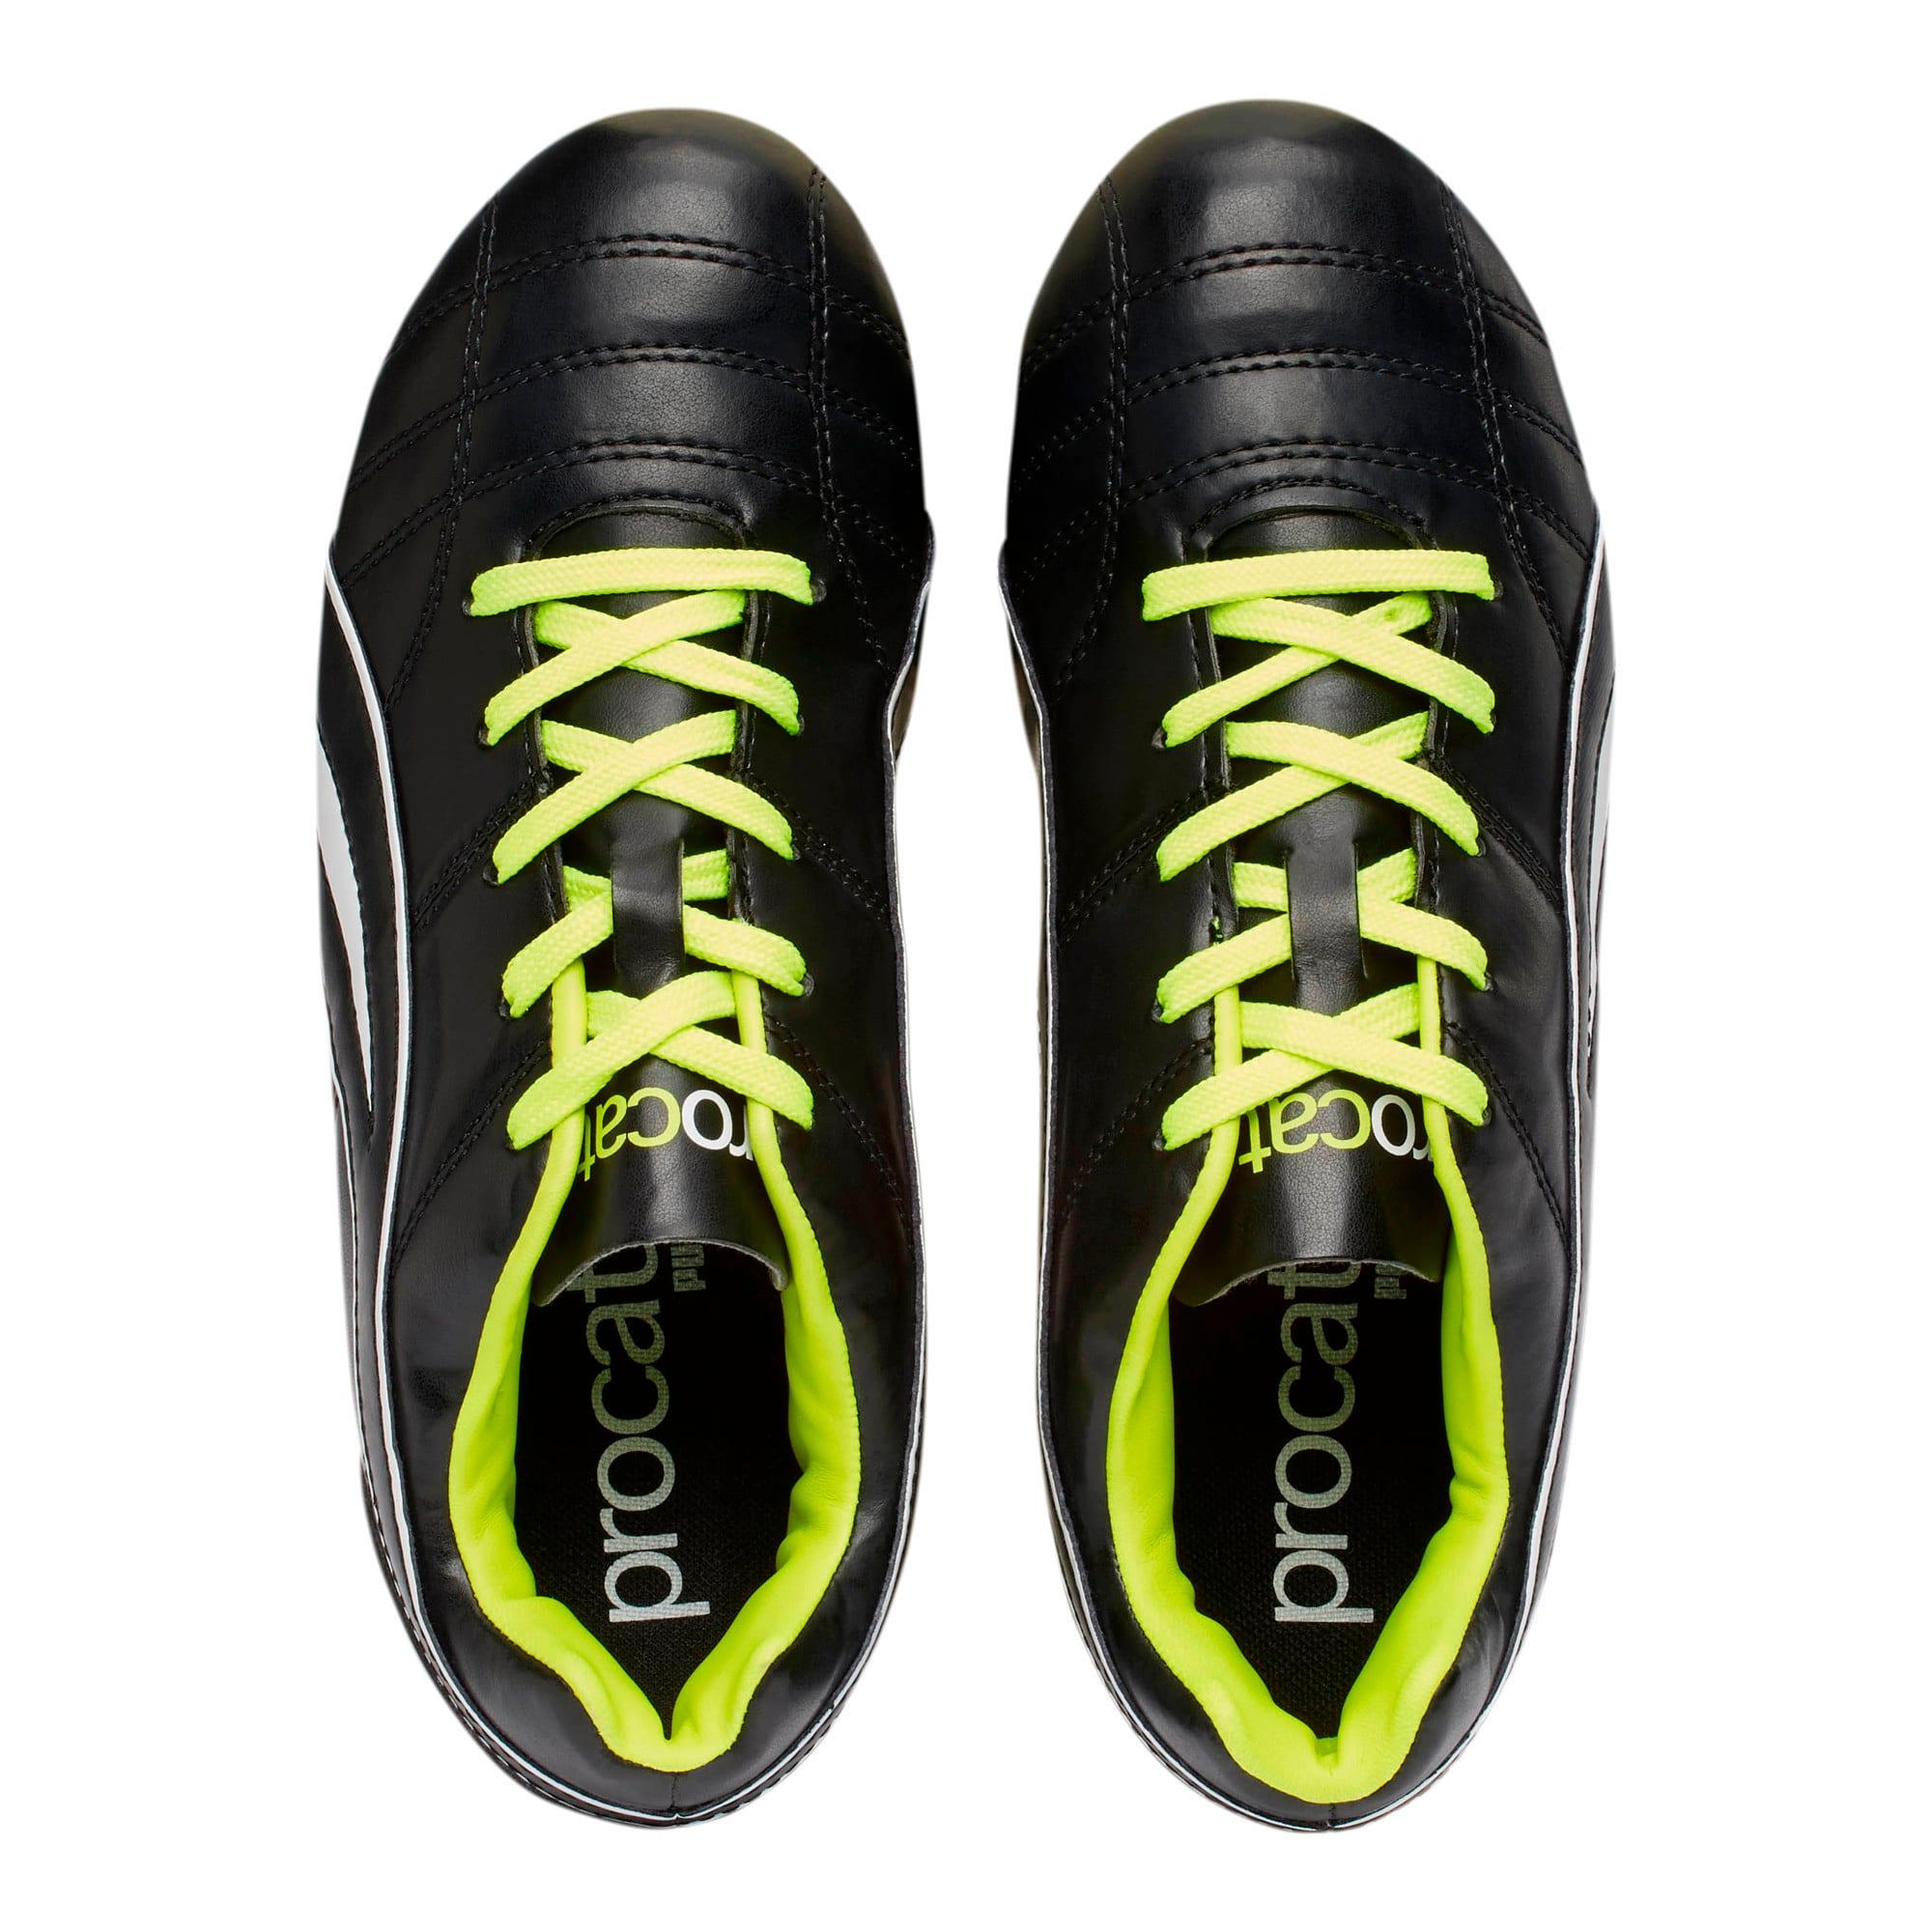 Thumbnail 6 of ProCat Boys' Soccer Shoes JR, Black-Puma White-Red Blast, medium